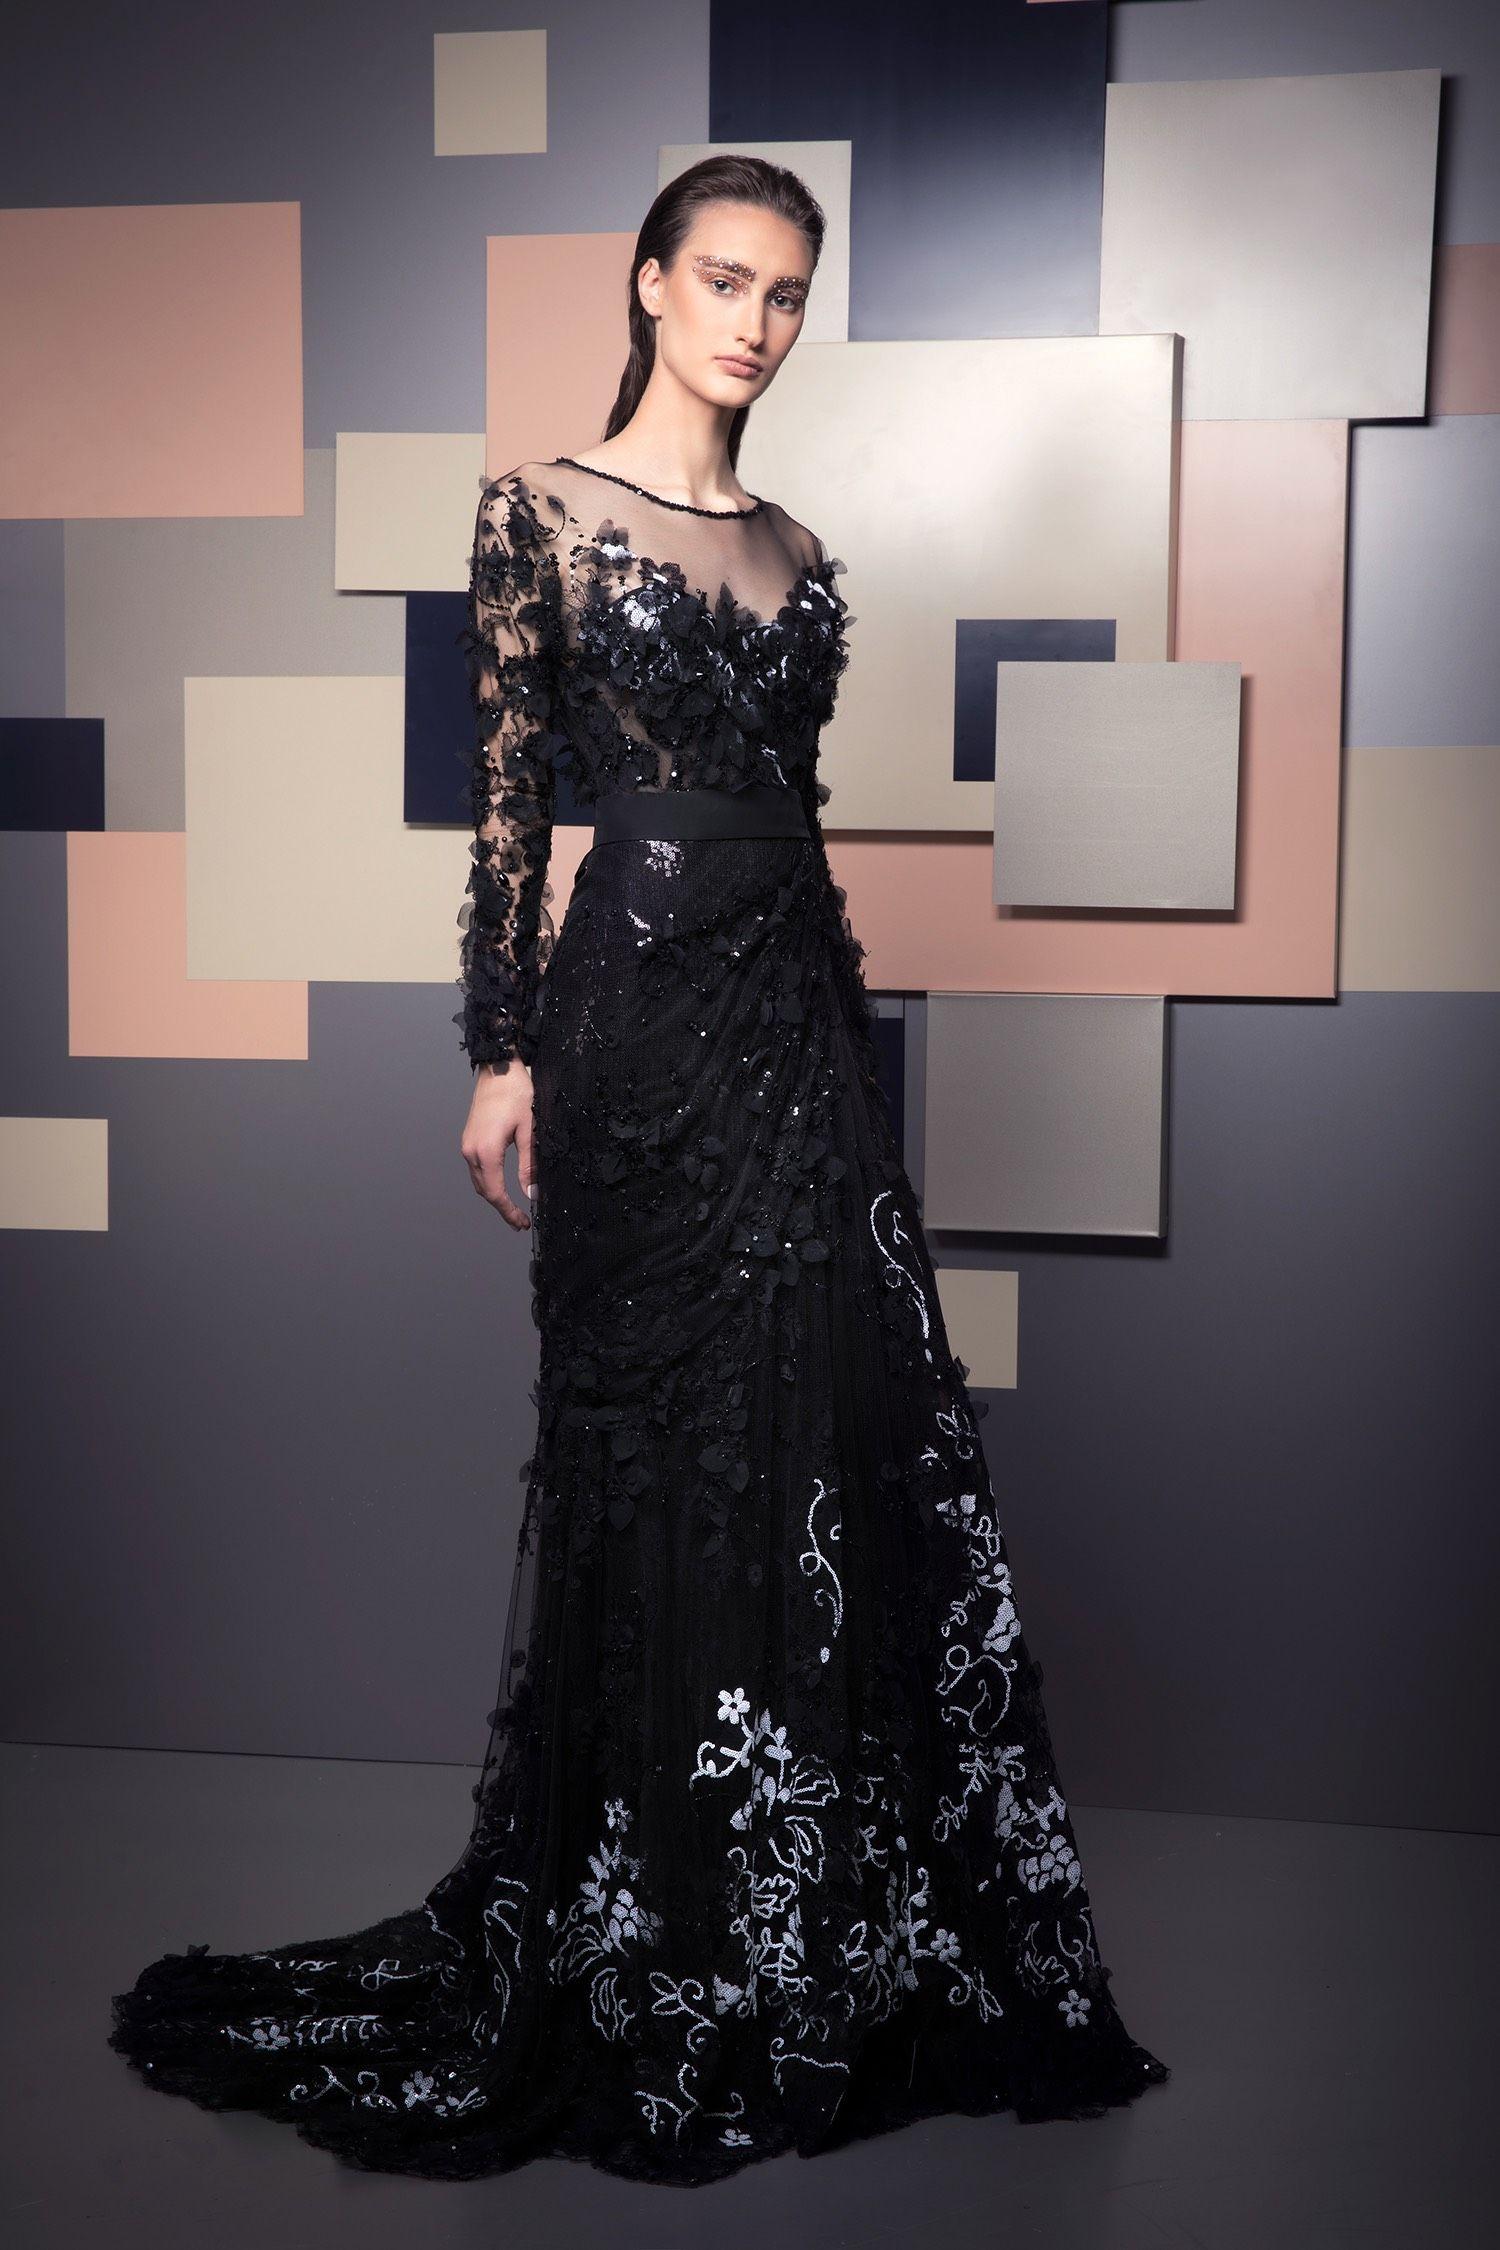 Womens Dresses | Gowns, Beautiful dresses, Dresses